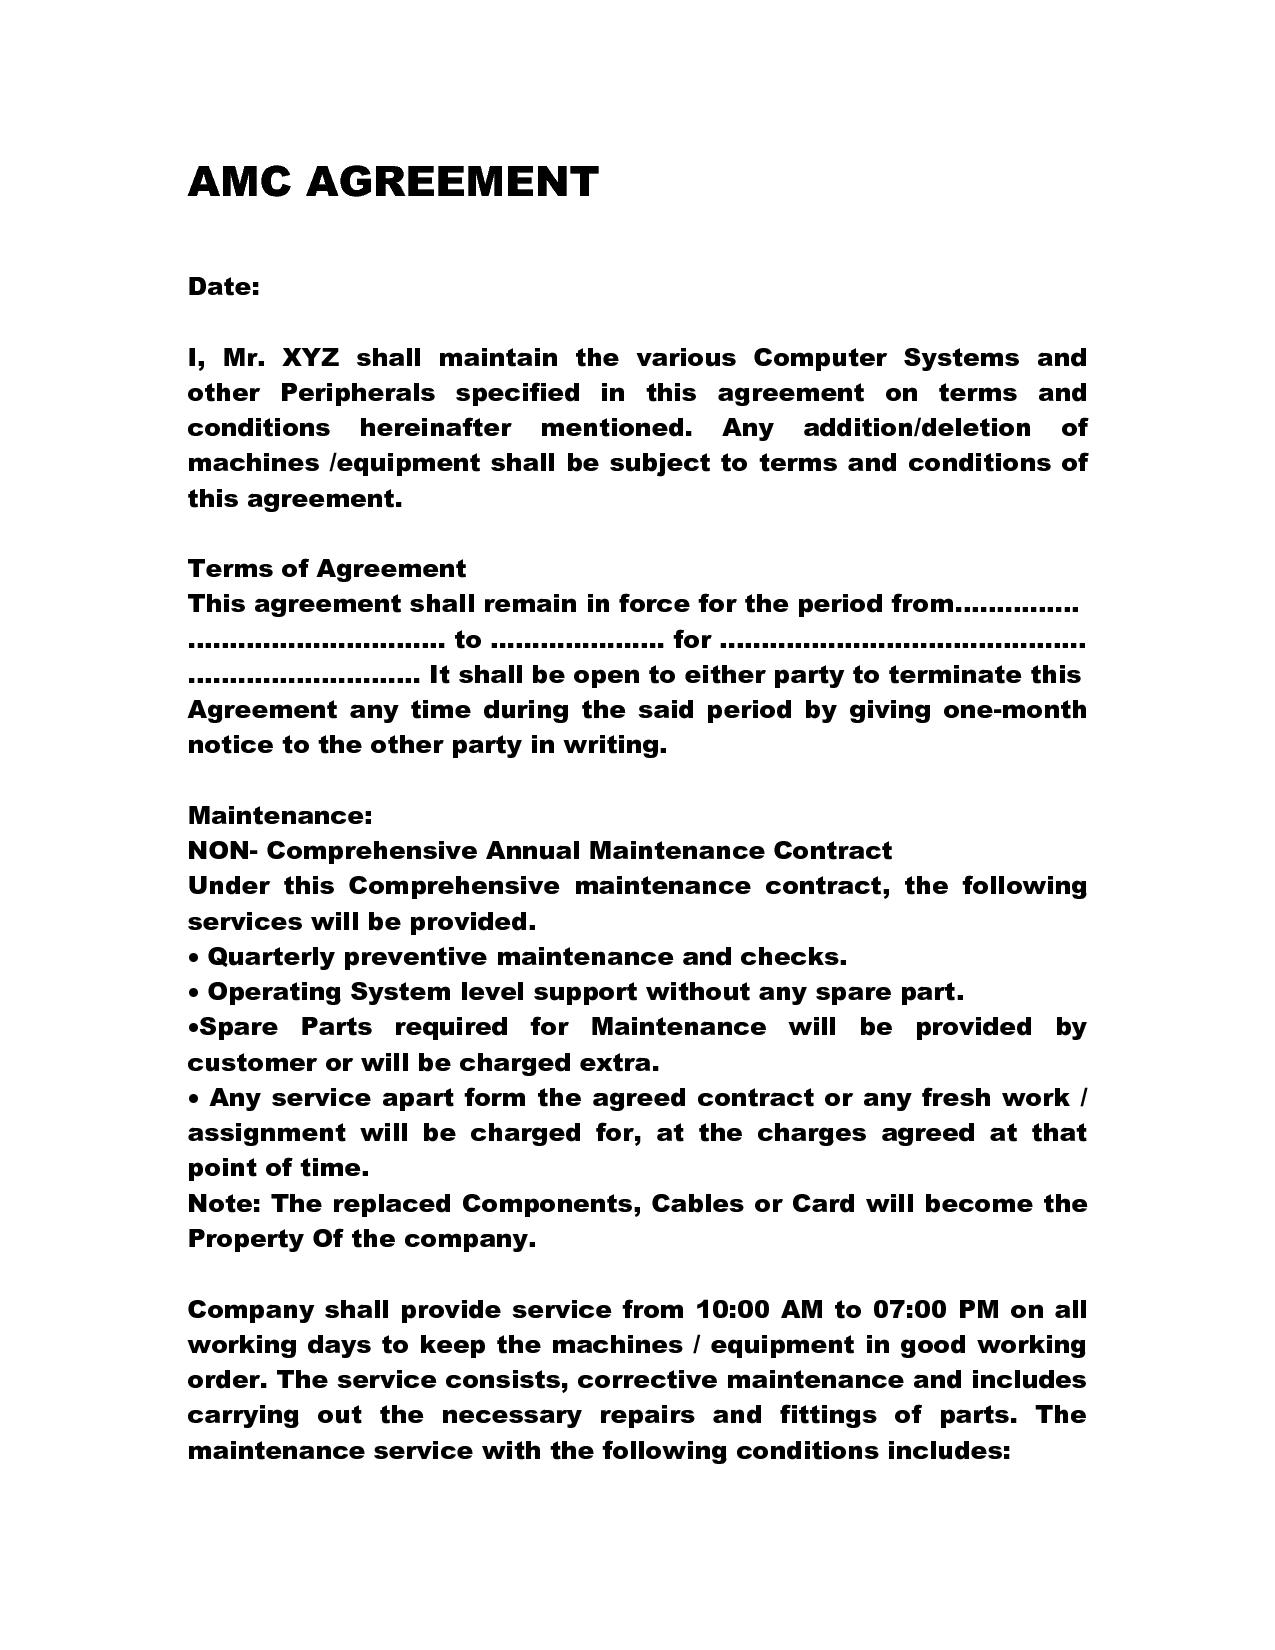 Annual Maintenance Contract Doc By Anks13 Computer Maintenance Rh Pinterest  Com Proposal Contract Template Sample Contract Proposal Template